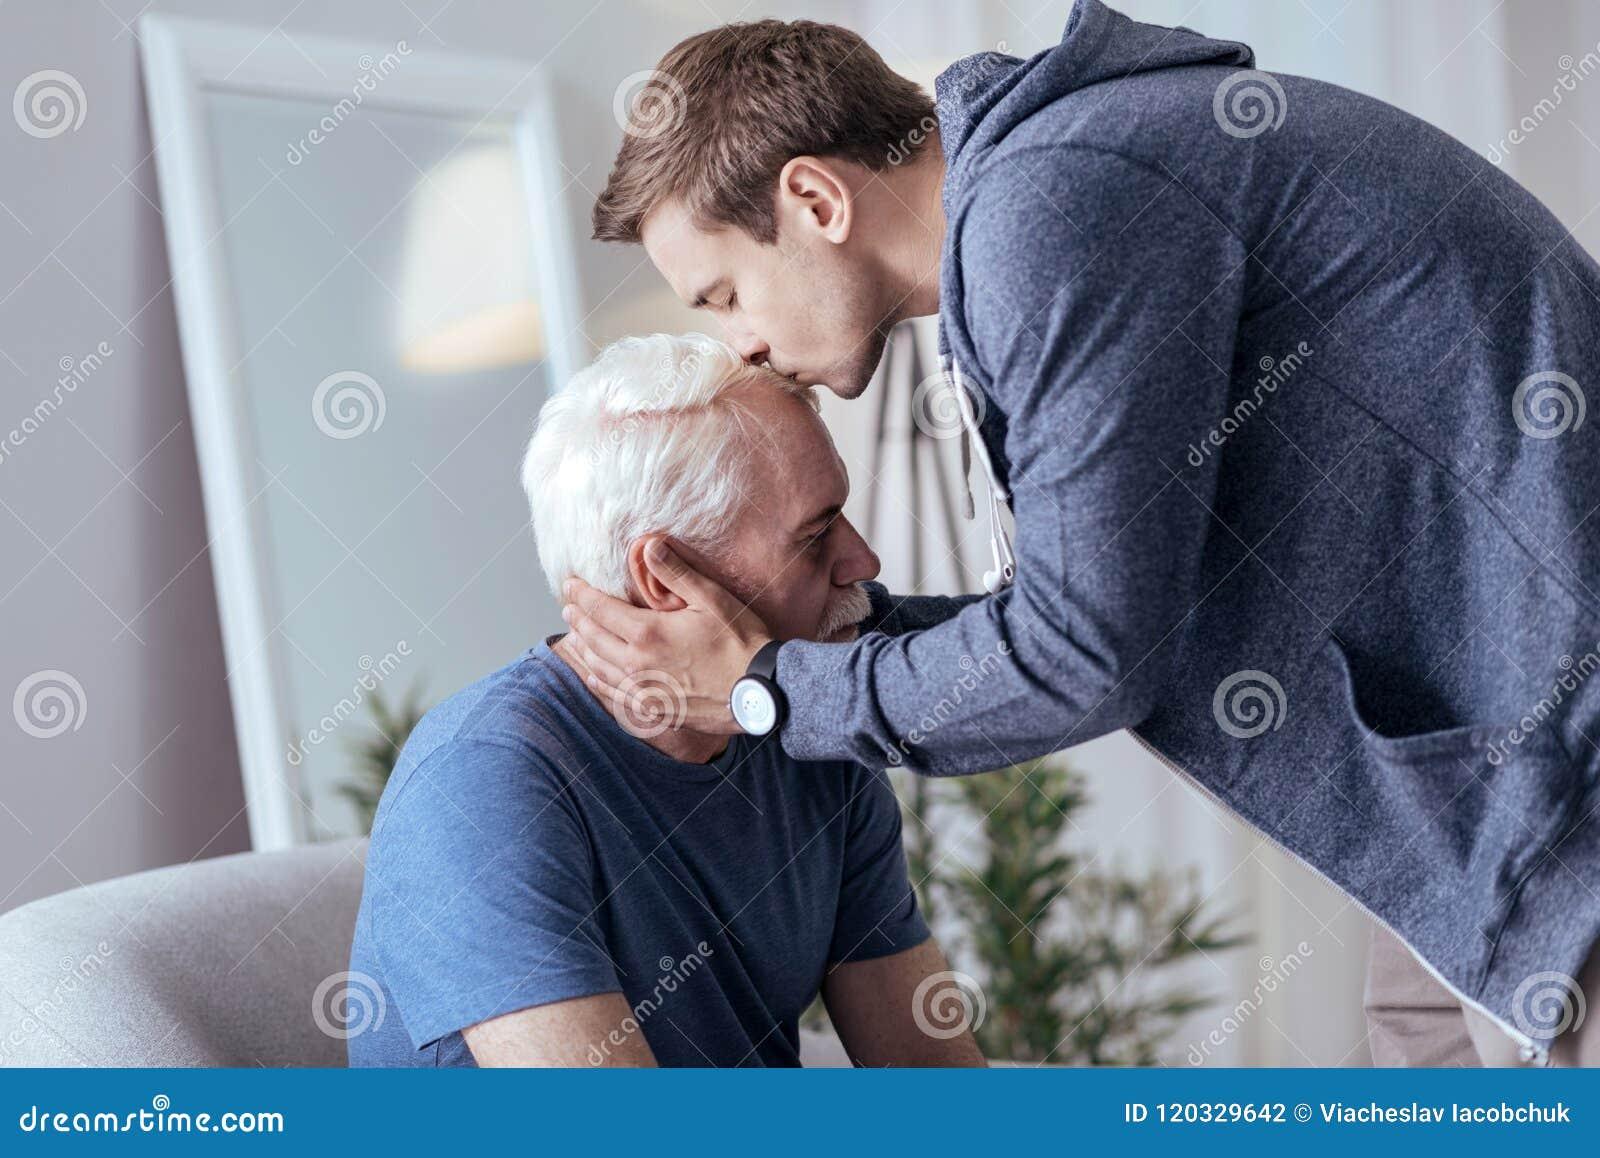 Loving man endorsing senior man